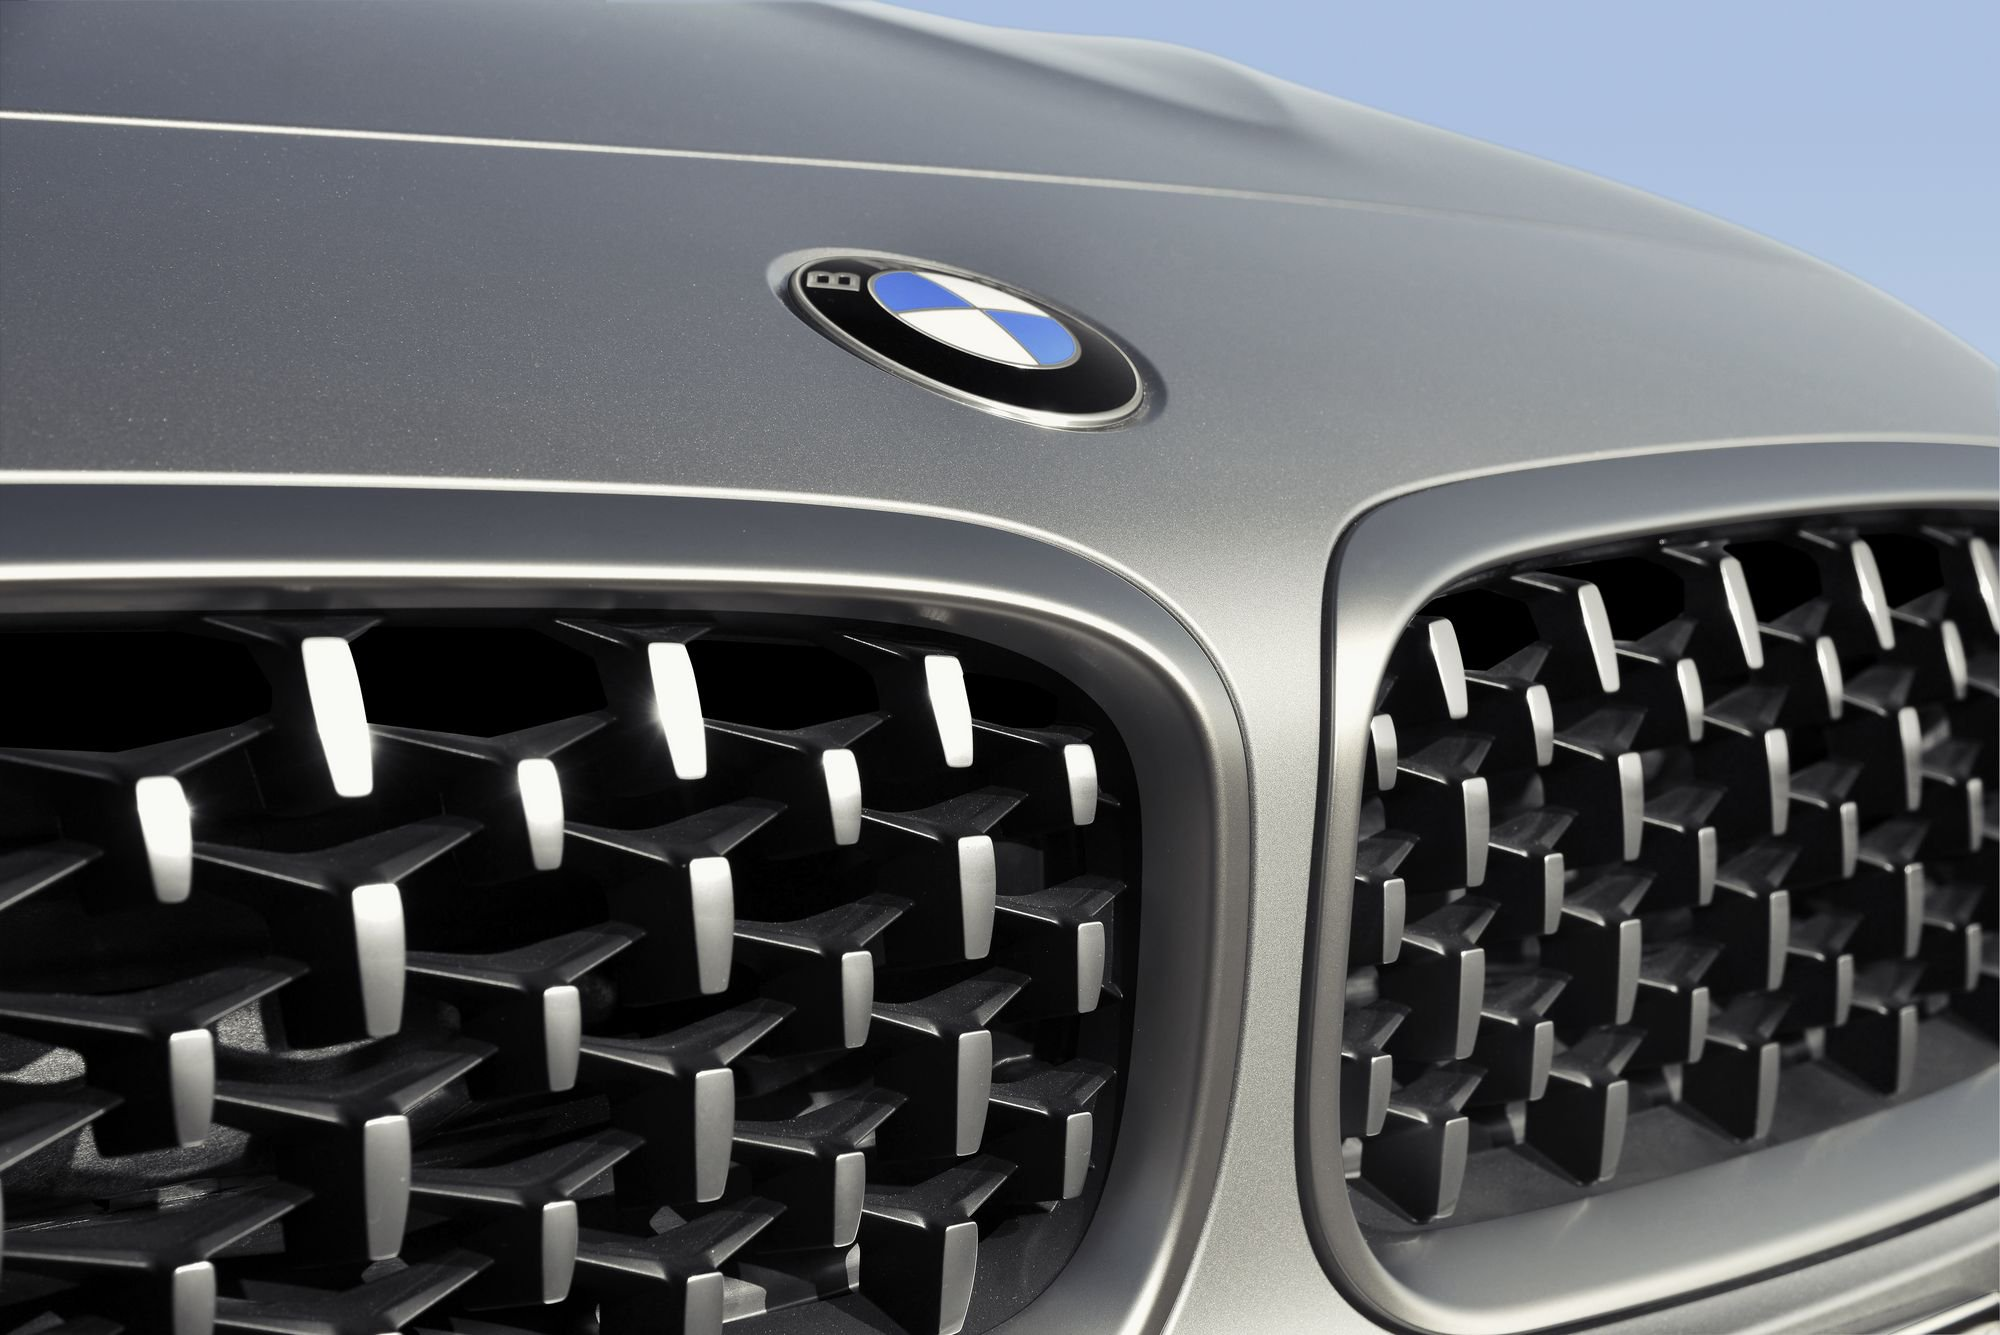 2019 BMW Z4 10 - BMW 2019 Z4 sDrive front 4k - BMW Z4 Wallpaper, Bmw z4 front wallpaper 4k